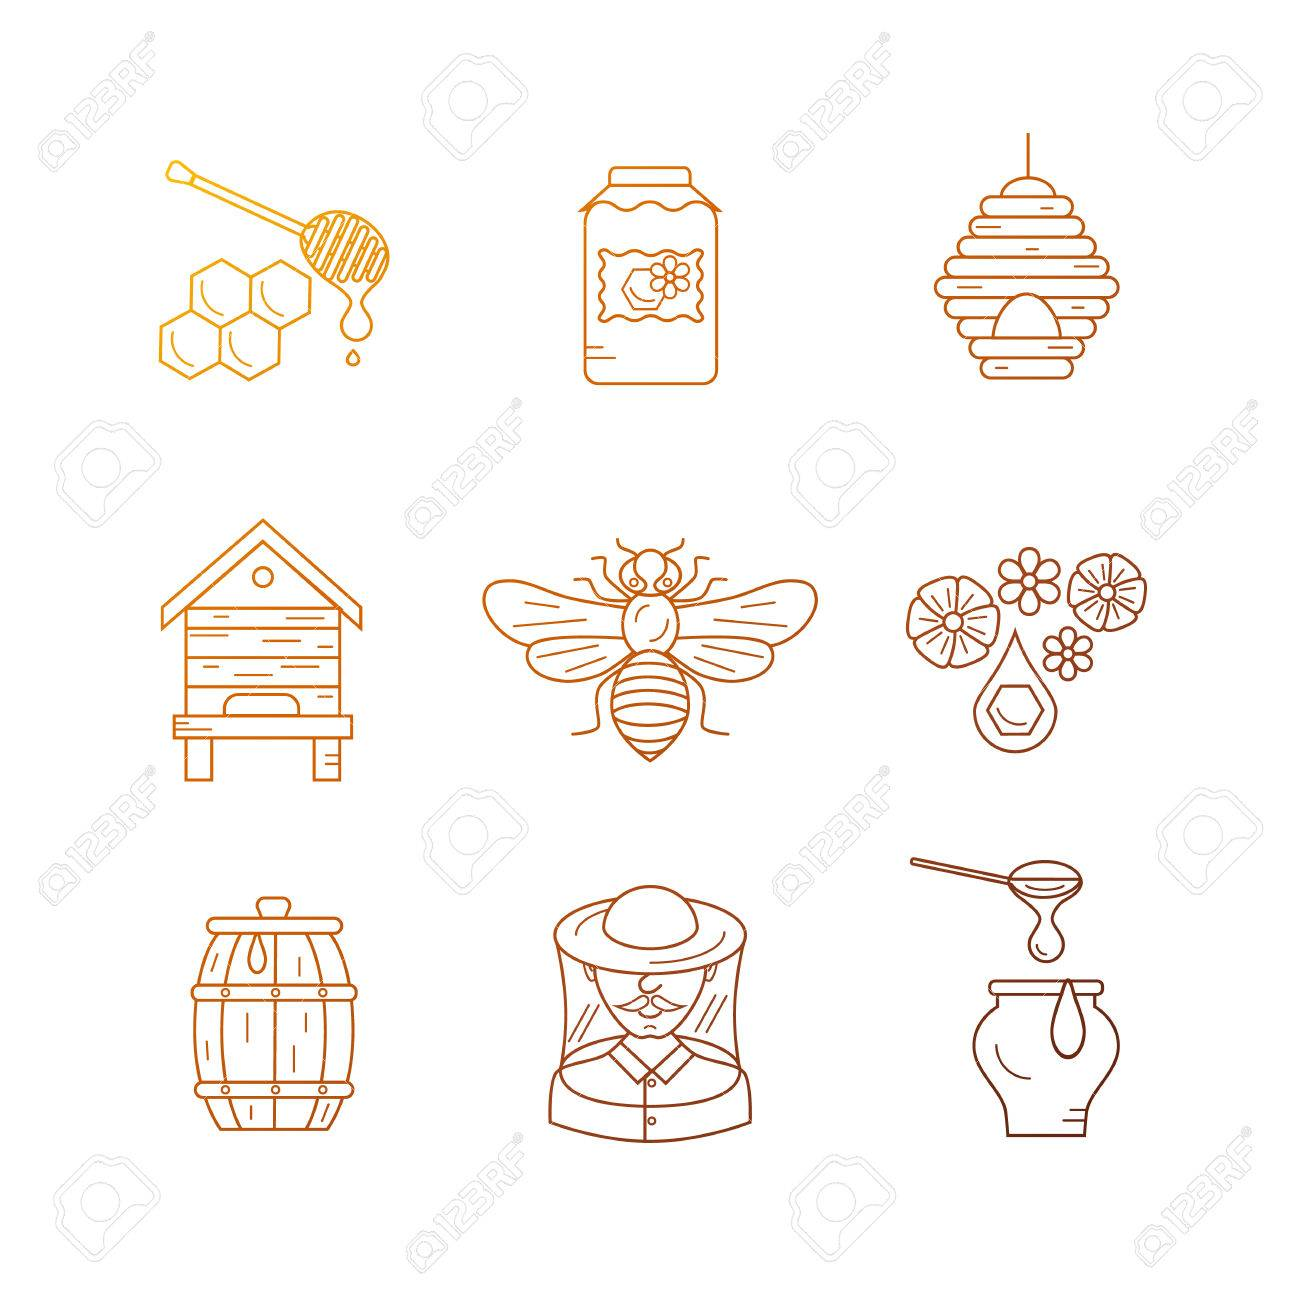 Apiary Flat Illustration Apiarist Vector Symbols Bee Honey House Beekeeper